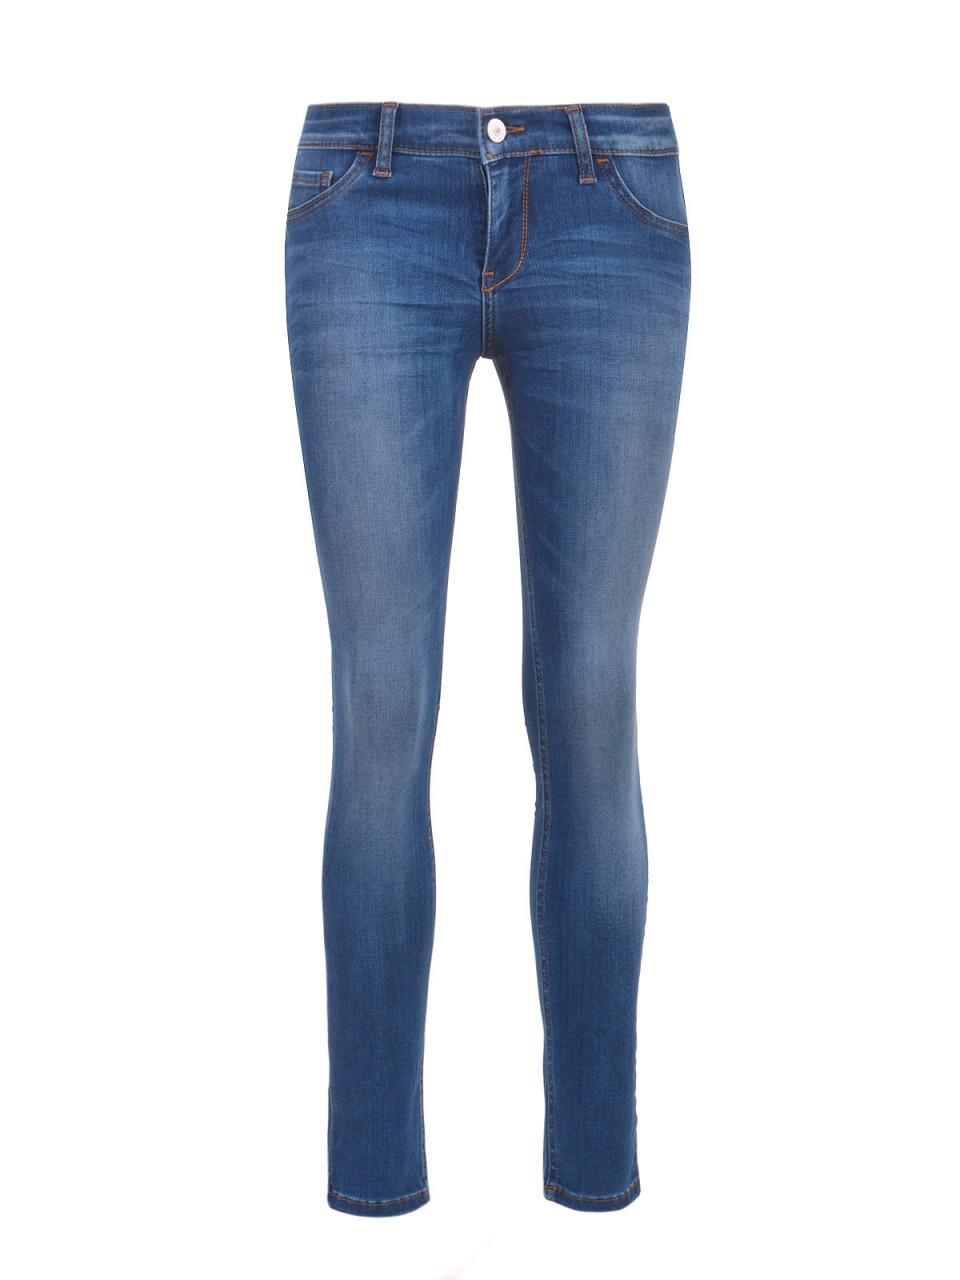 ltb-damen-jeans-blau